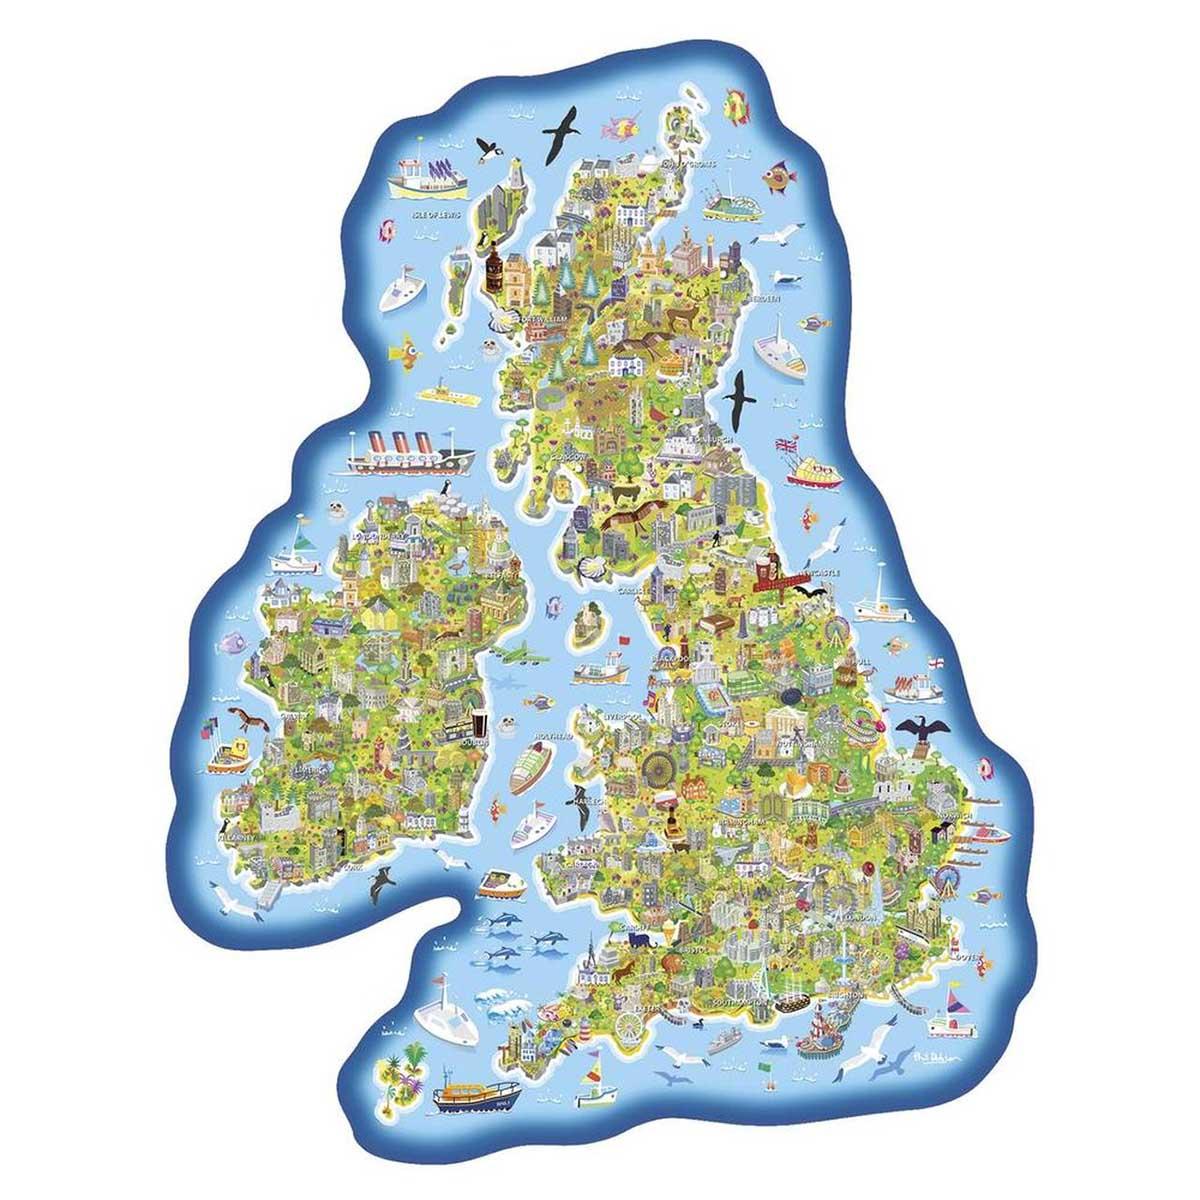 Jigmap Britain & Ireland Maps / Geography Jigsaw Puzzle